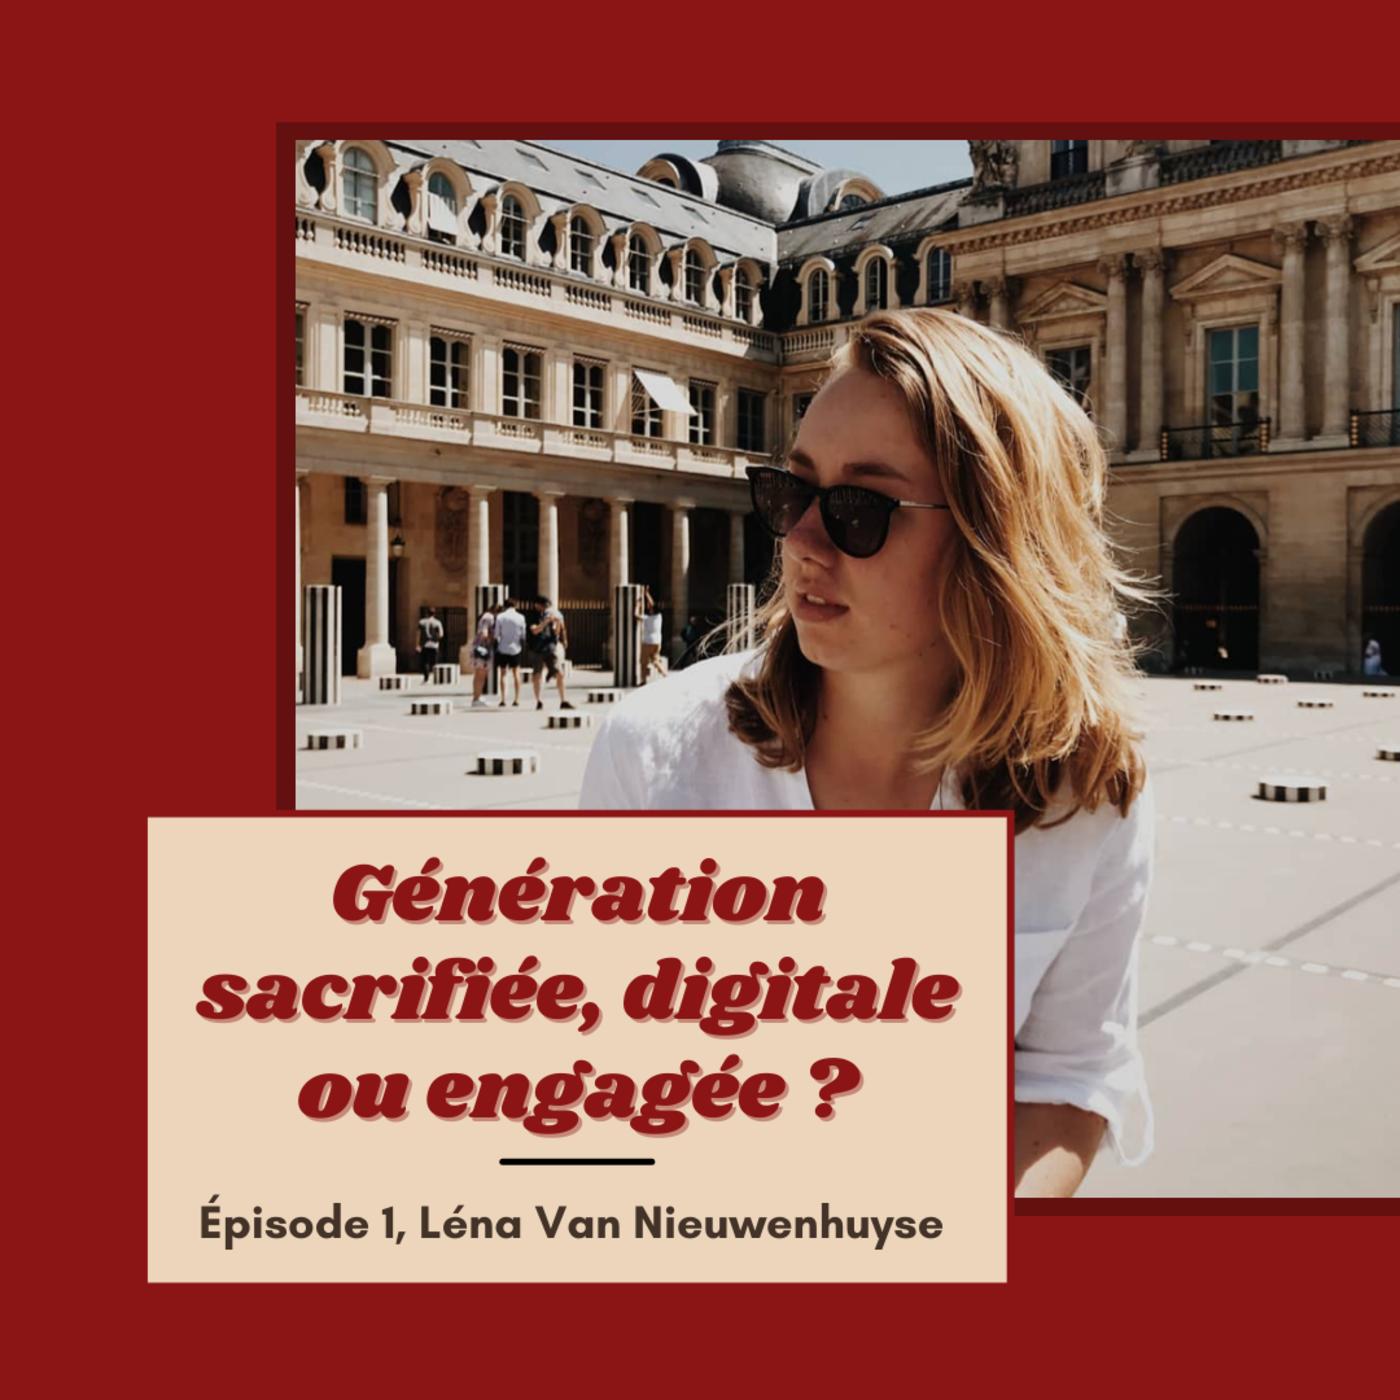 #1 Génération sacrifiée, digitale ou engagée ? Avec Léna Van Nieuwenhuyse